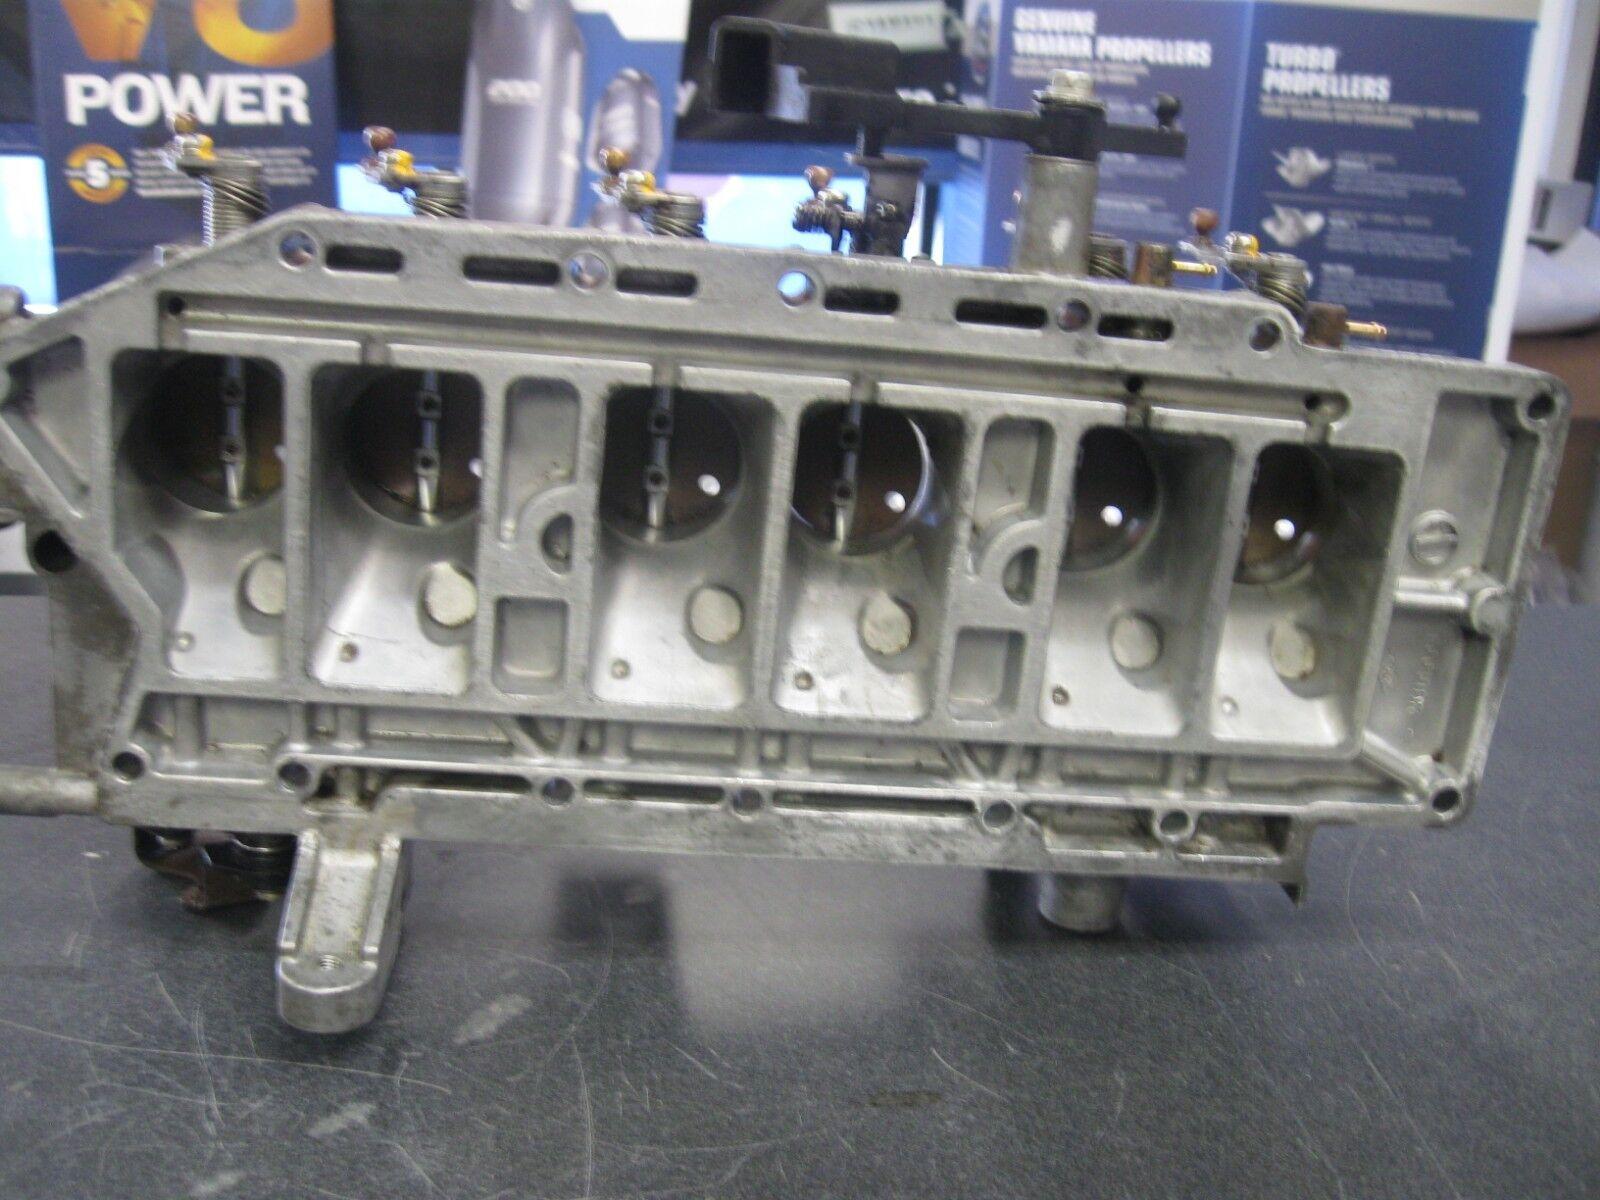 Yamaha Außenborder Außenborder Yamaha Drosselklappengehäuse 1 68F-13751-00-00 d1ca6c